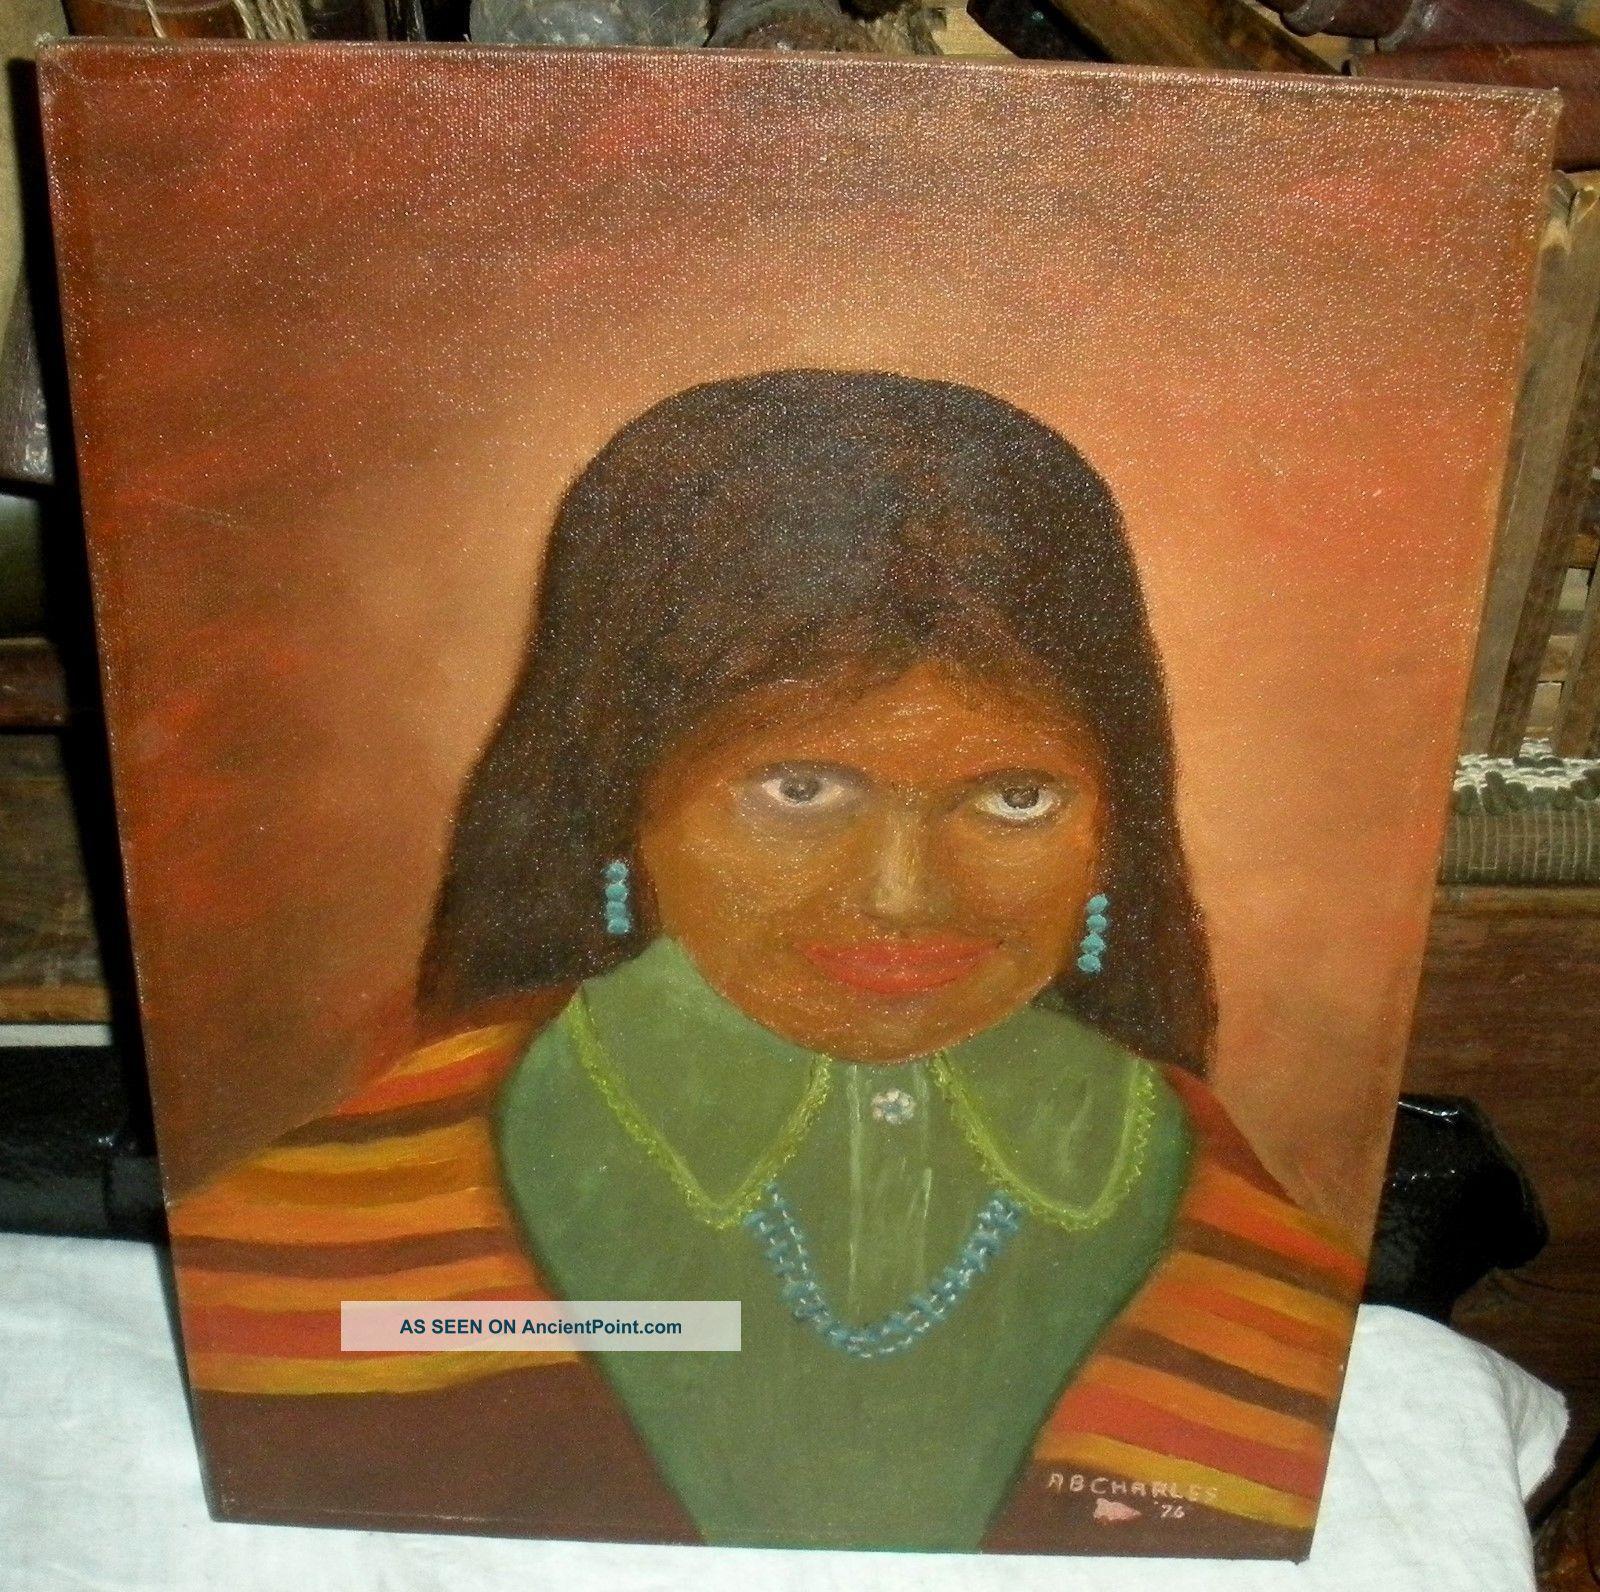 Vintage 1976 Albert Charles Painting Of Navajo Indian Woman Id'd Vafo Native American photo